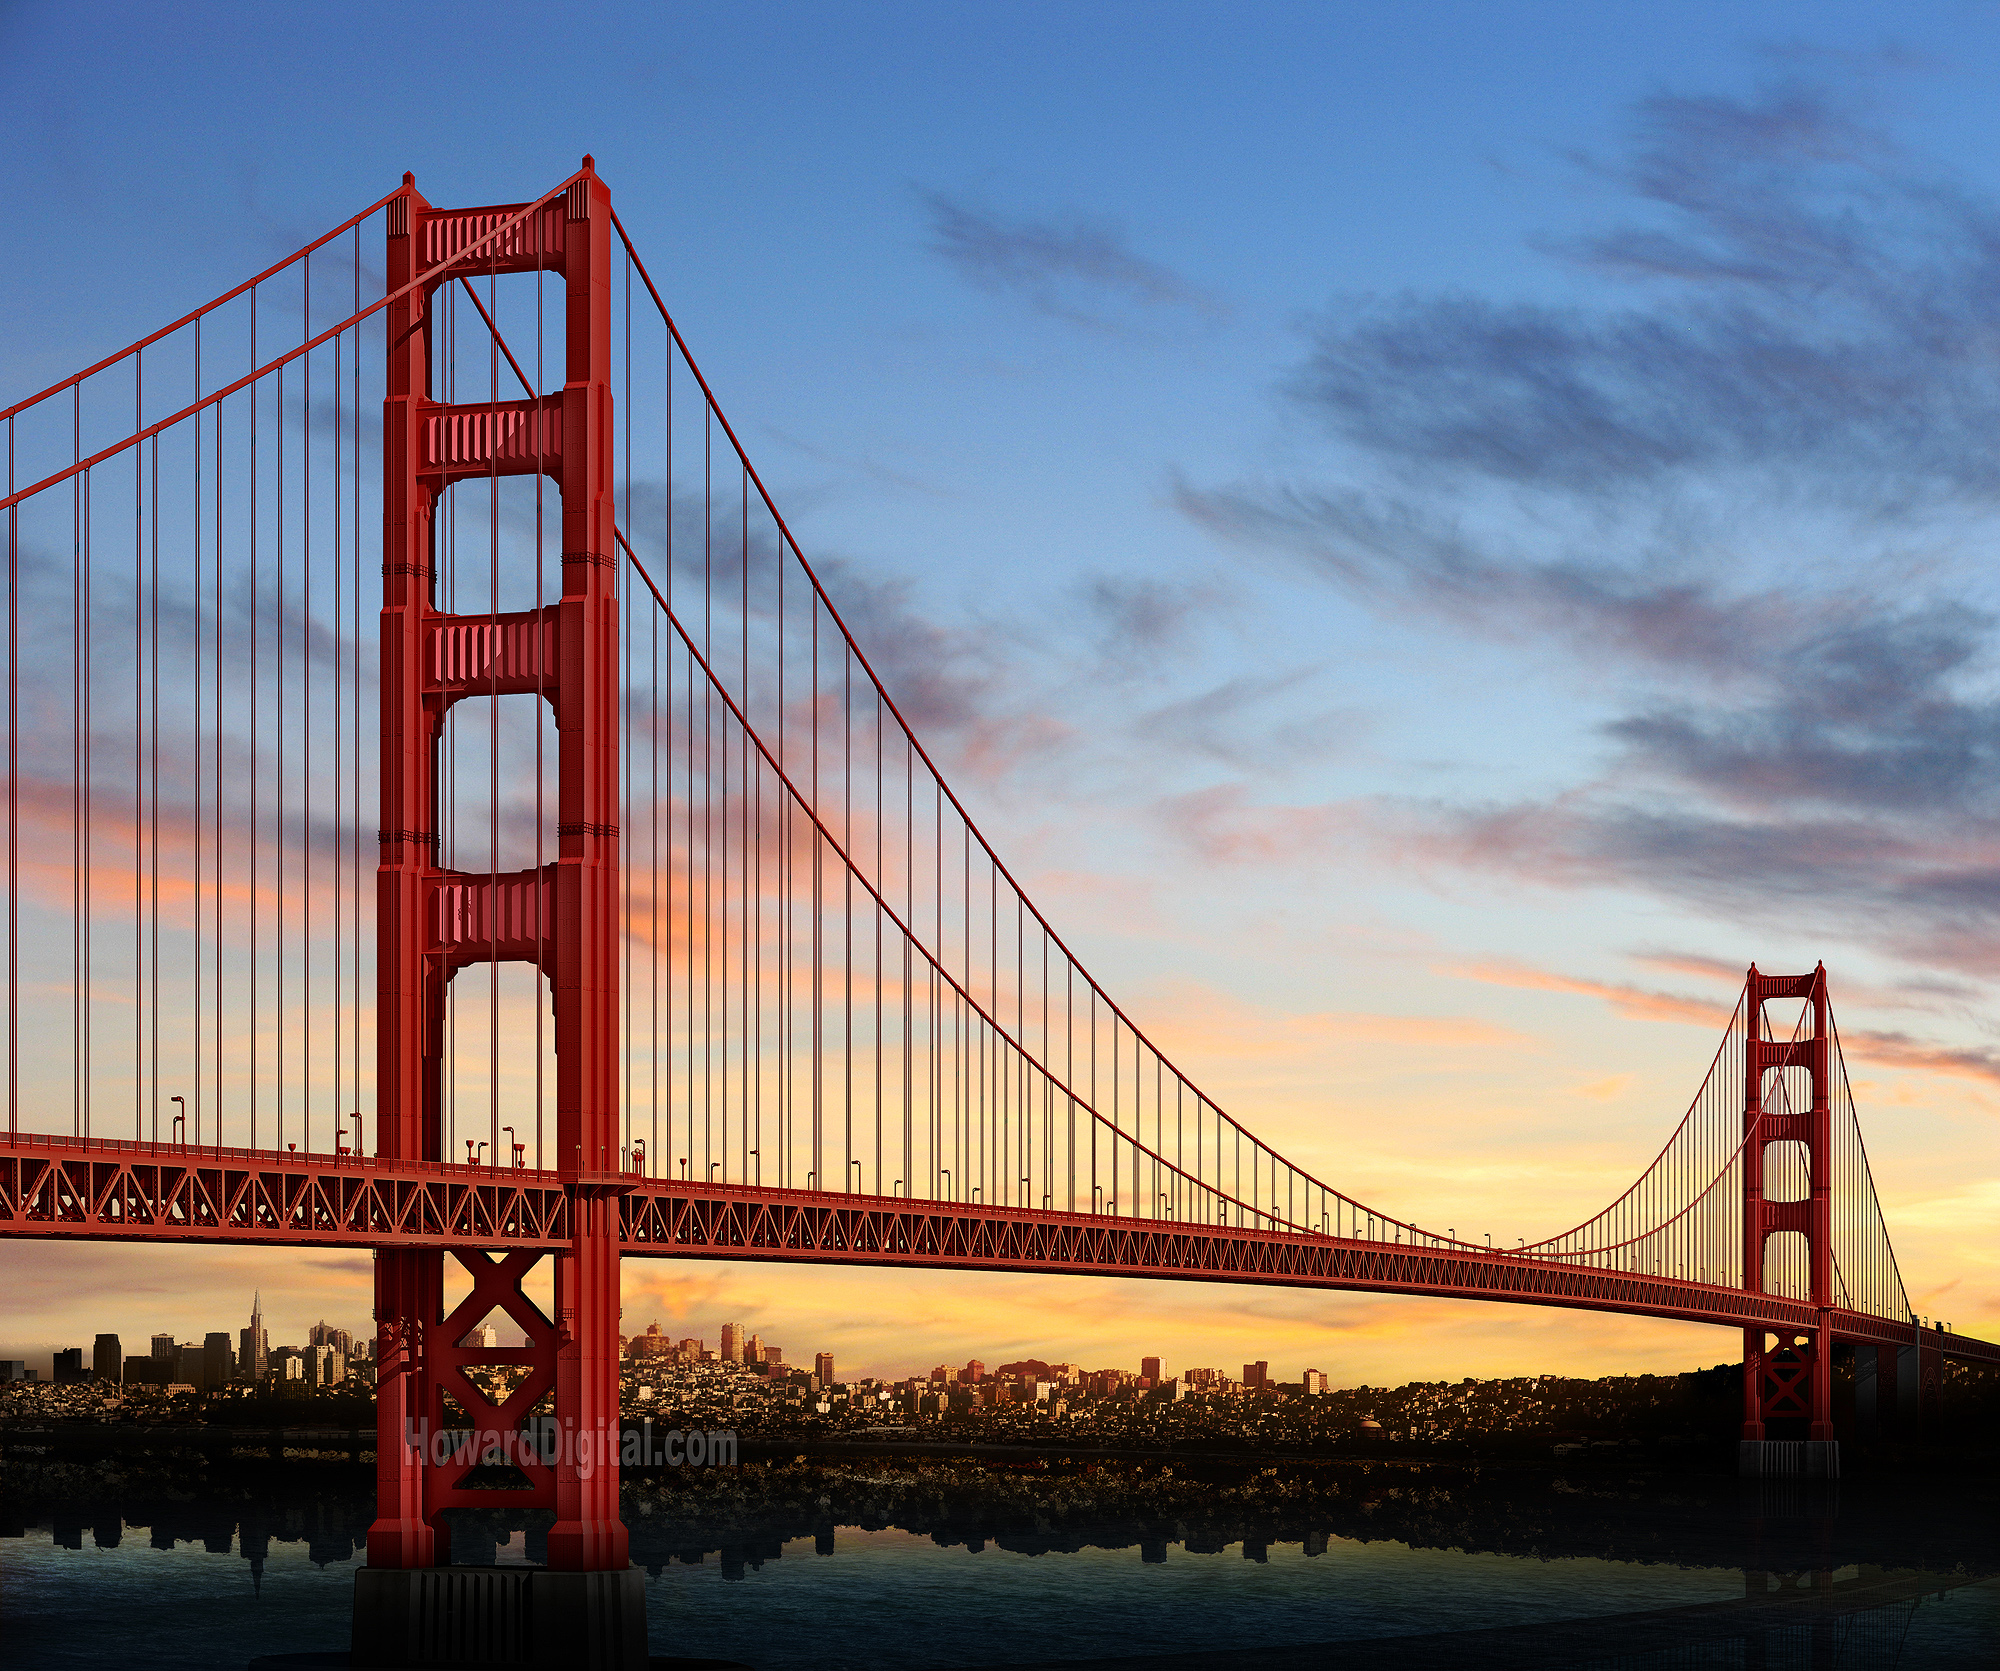 Golden Gate Bridge San Francisco California Sunset Picture: Golden Gate Silhouette Renderings